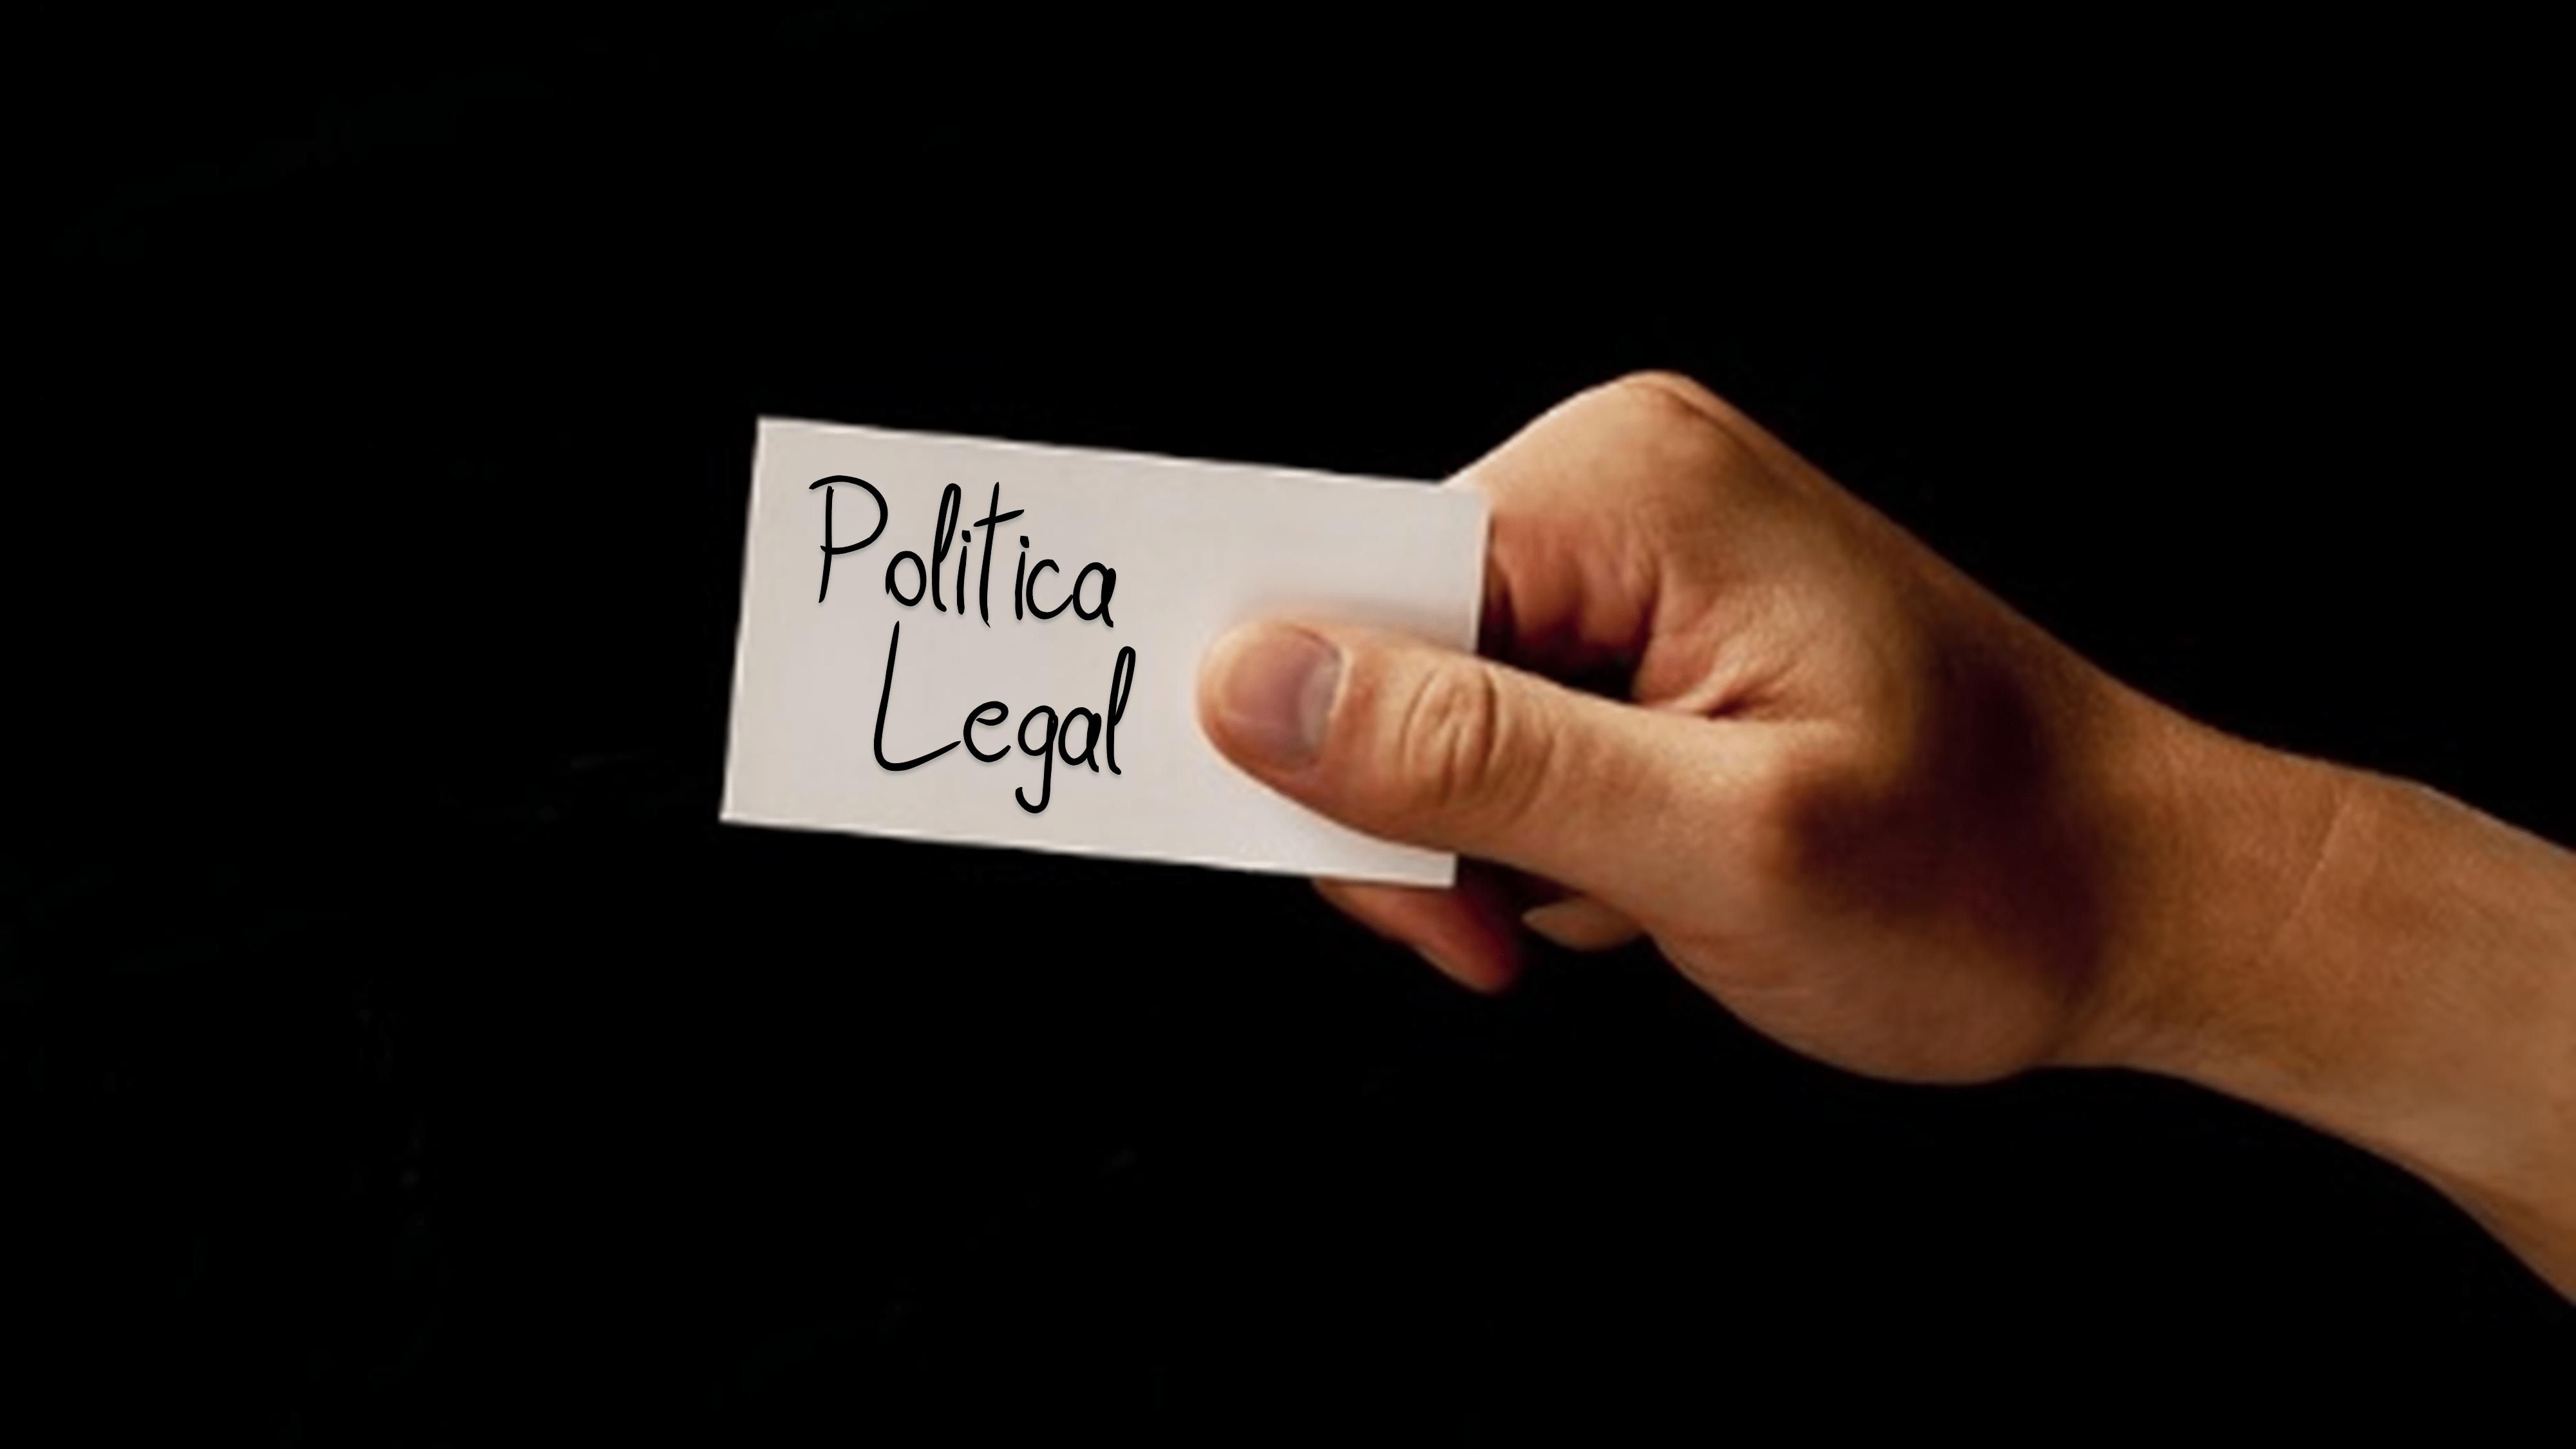 Politicas - Politica Legal